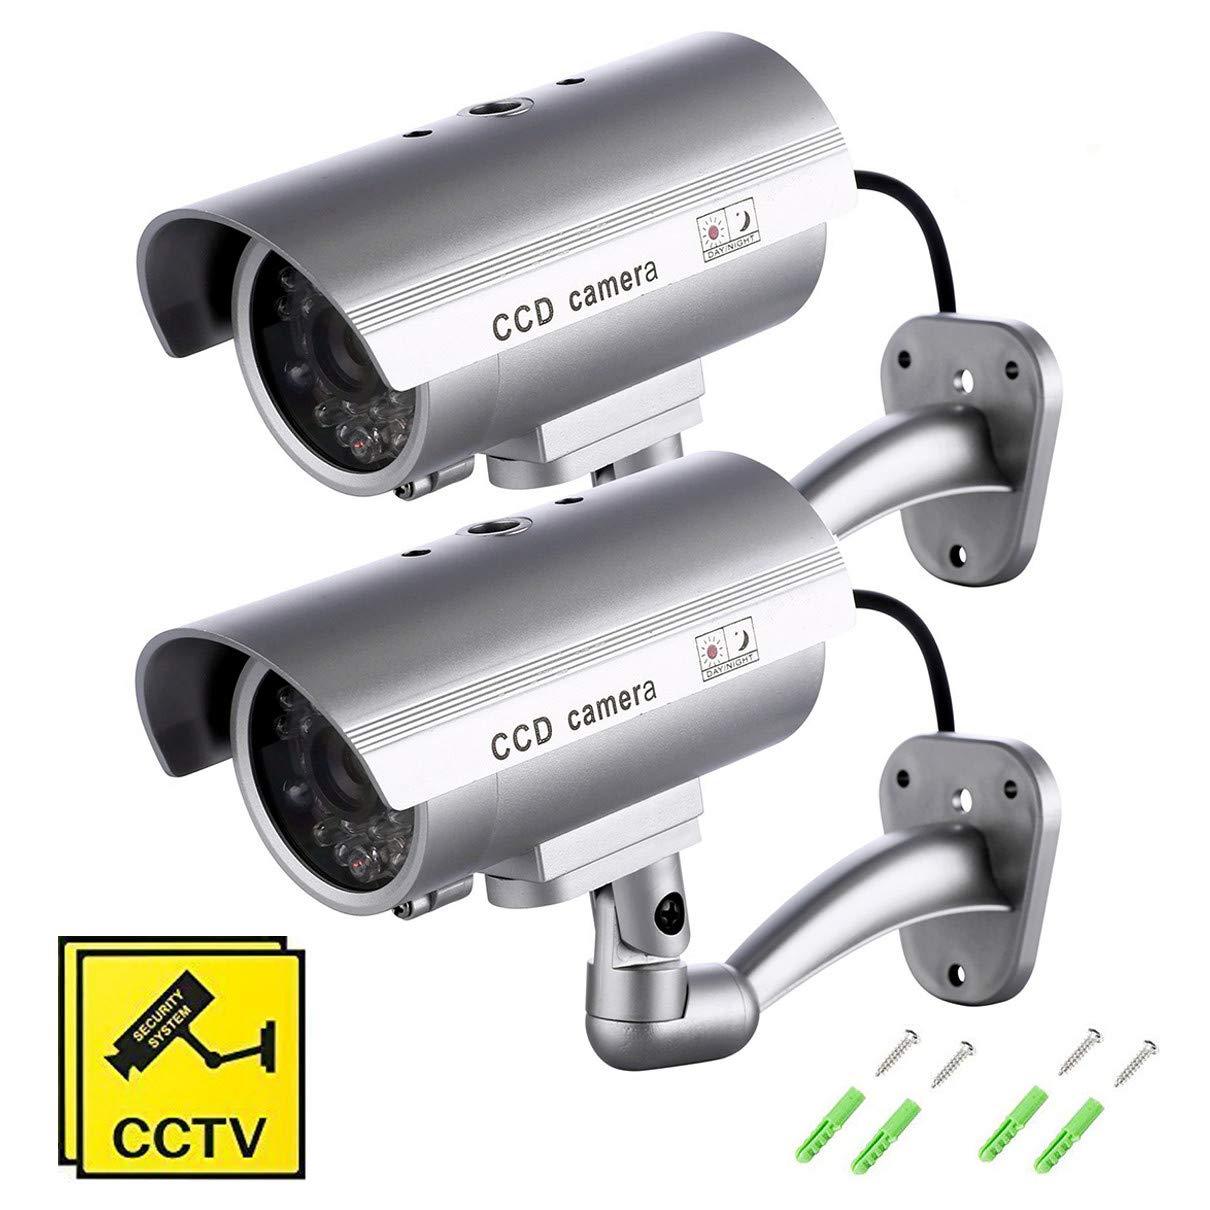 SeeKool Cámara Falsa,2Pcs Dummy Cámara de Seguridad,Cámara Simulada Falsa Inalámbrico Sistema de Vigilancia IR LED Parpadeante Fake Cámara Simulada CCTV product image